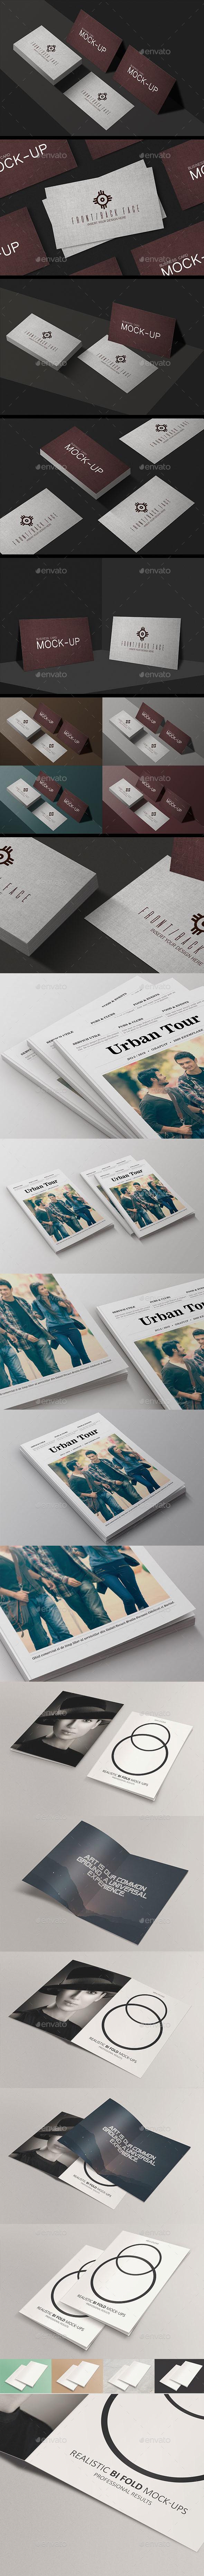 Design Presentation Mock-Ups Bundle - Miscellaneous Print